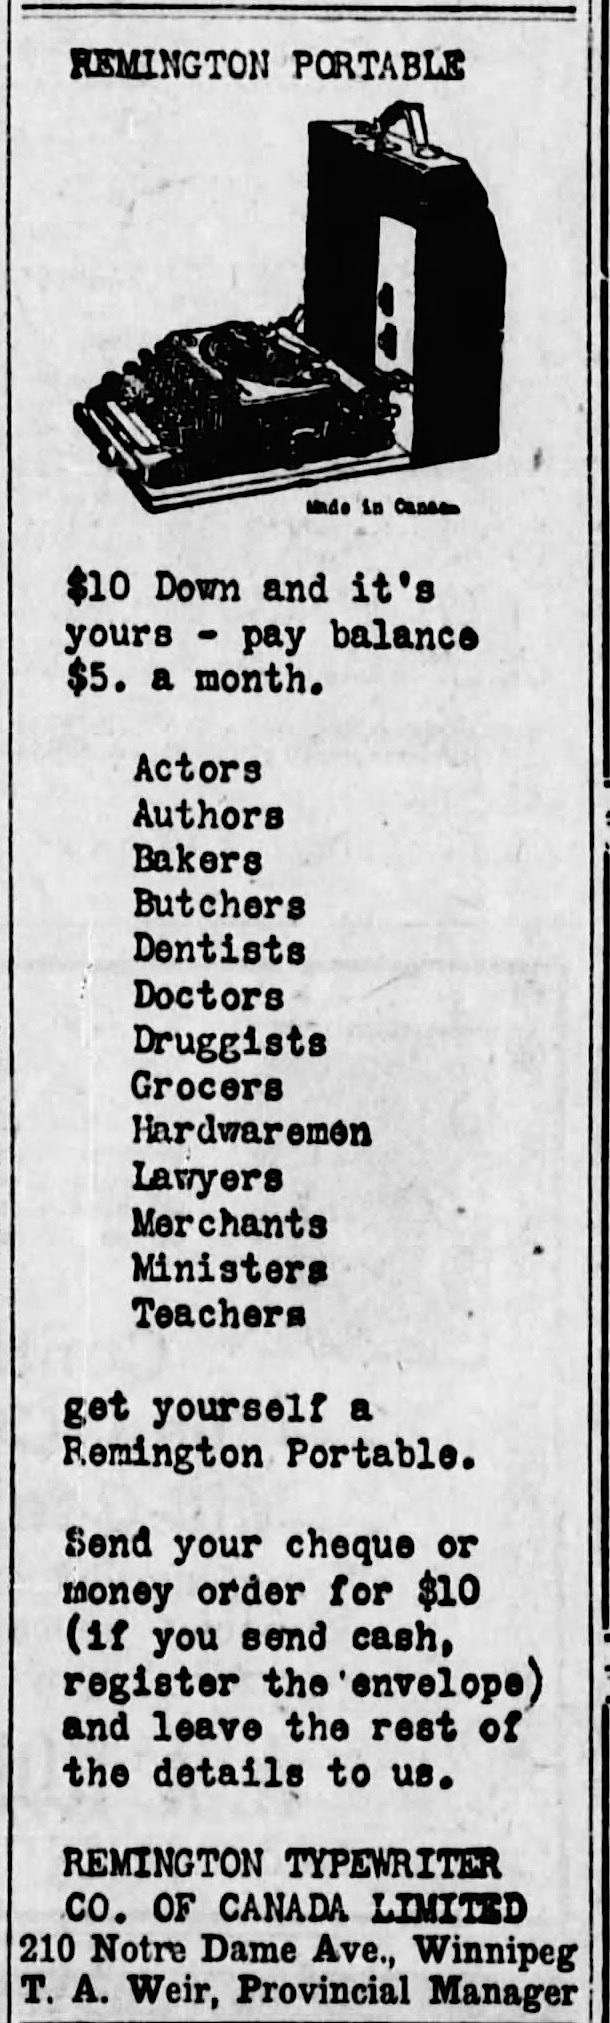 The Winnipeg Tribune (Winnipeg, Manitoba, Canada), Apr 15, 1926